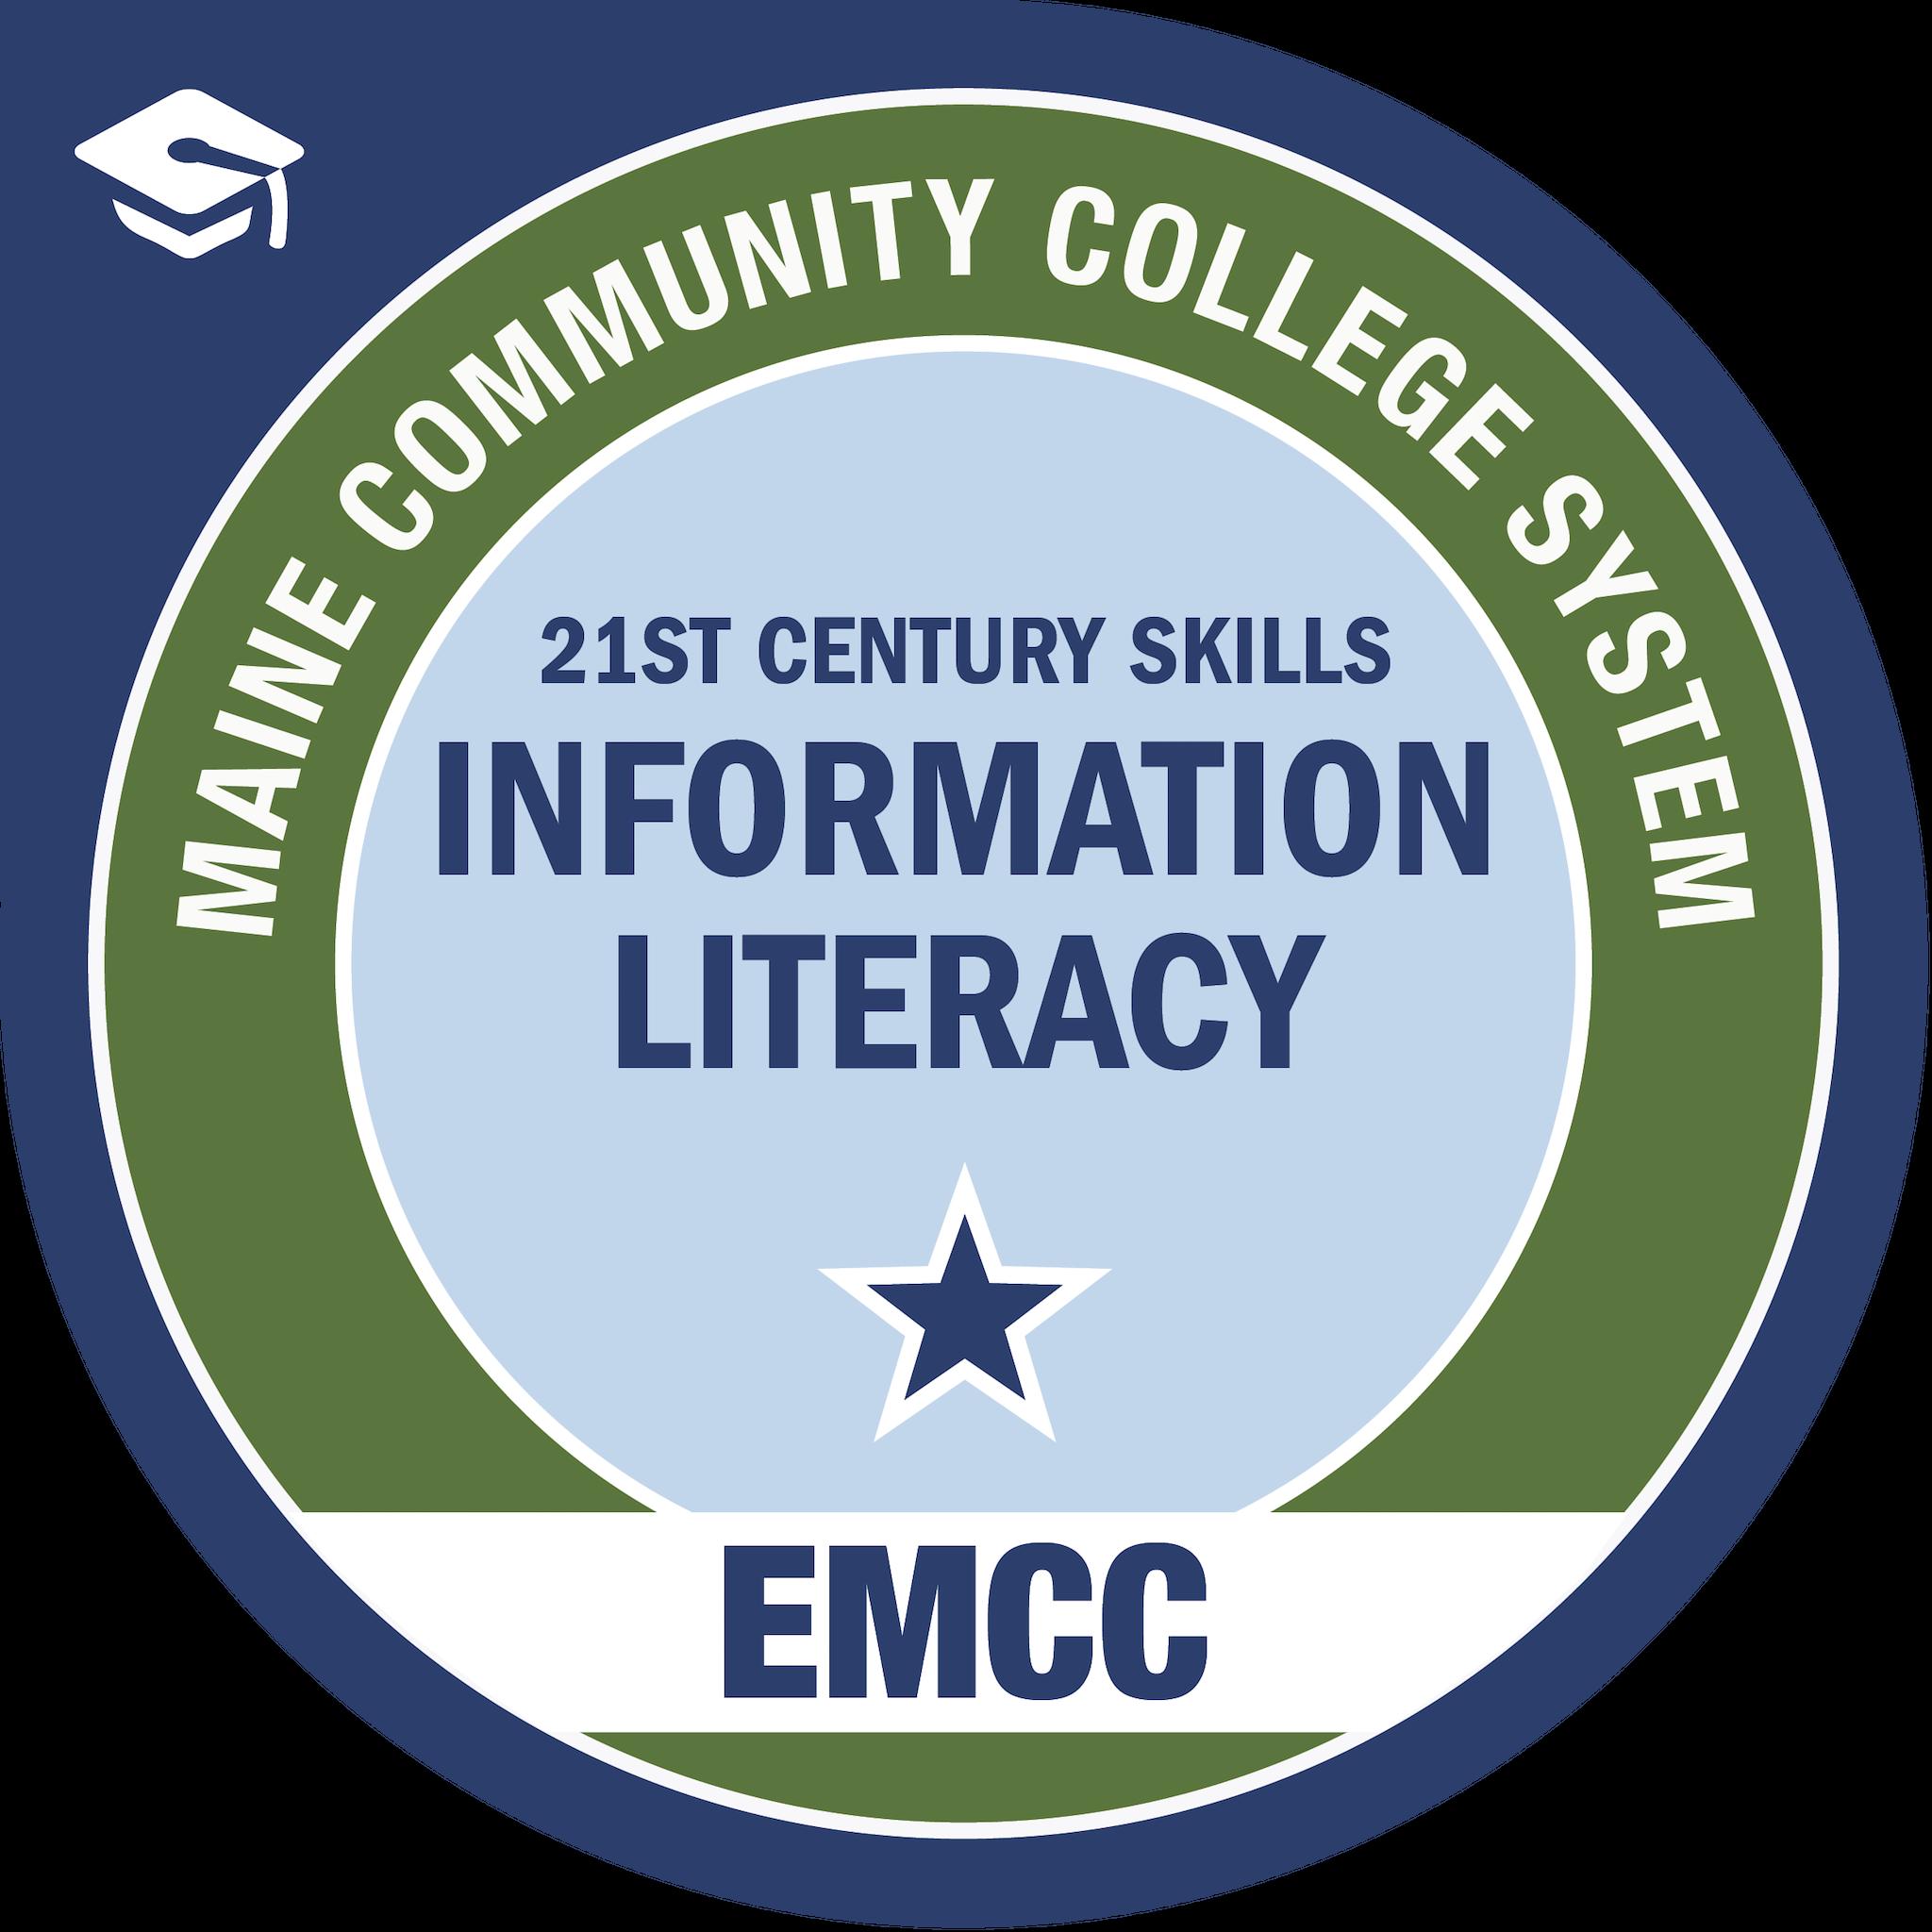 EMCC Information Literacy